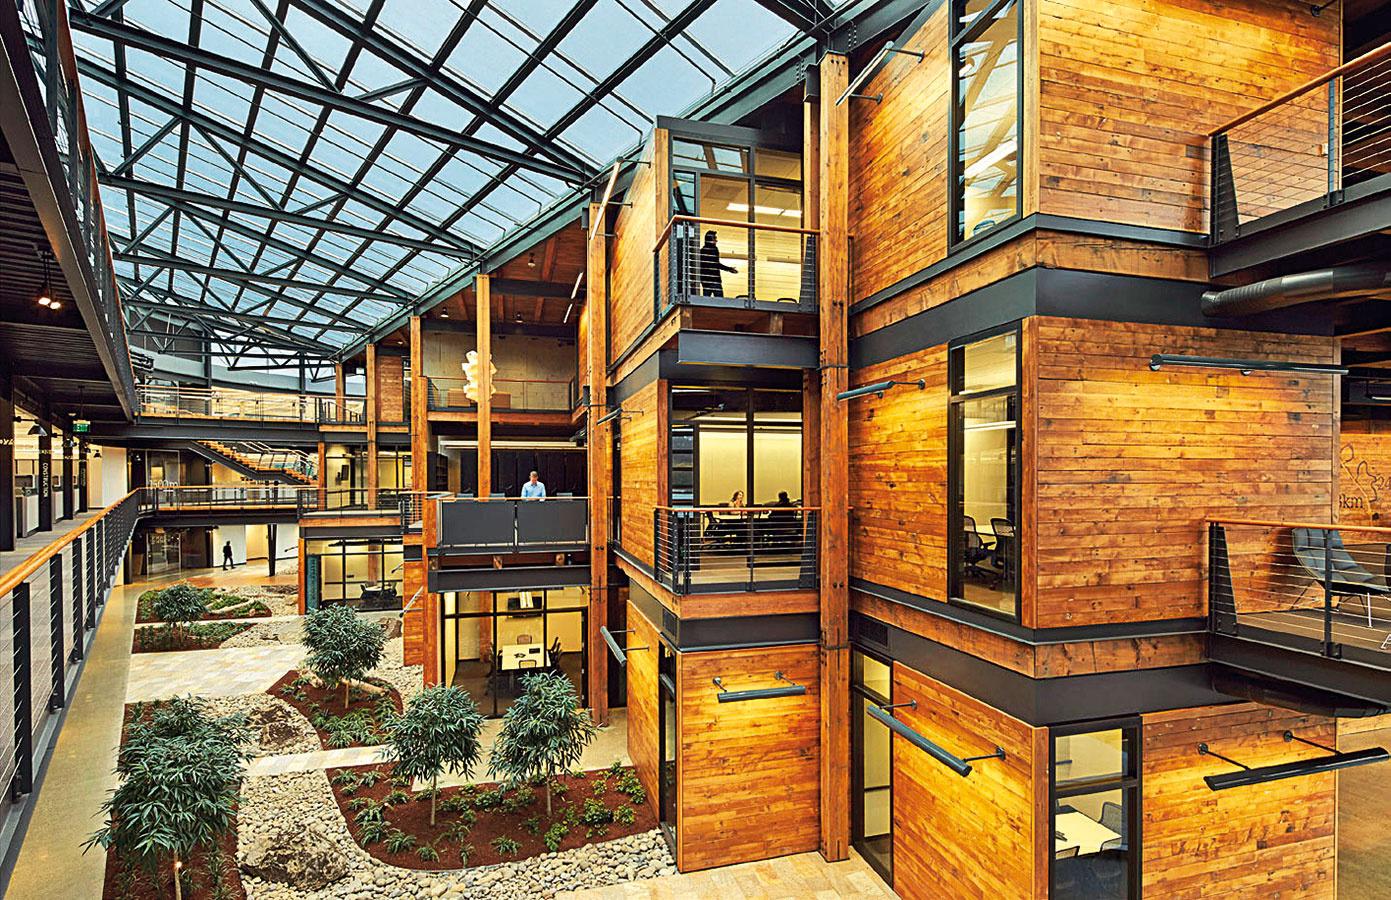 Komplex USACE Seattle District headquarters vUSA (architekti: ZGF Architects; zdroj: themilitaryengineer.com)